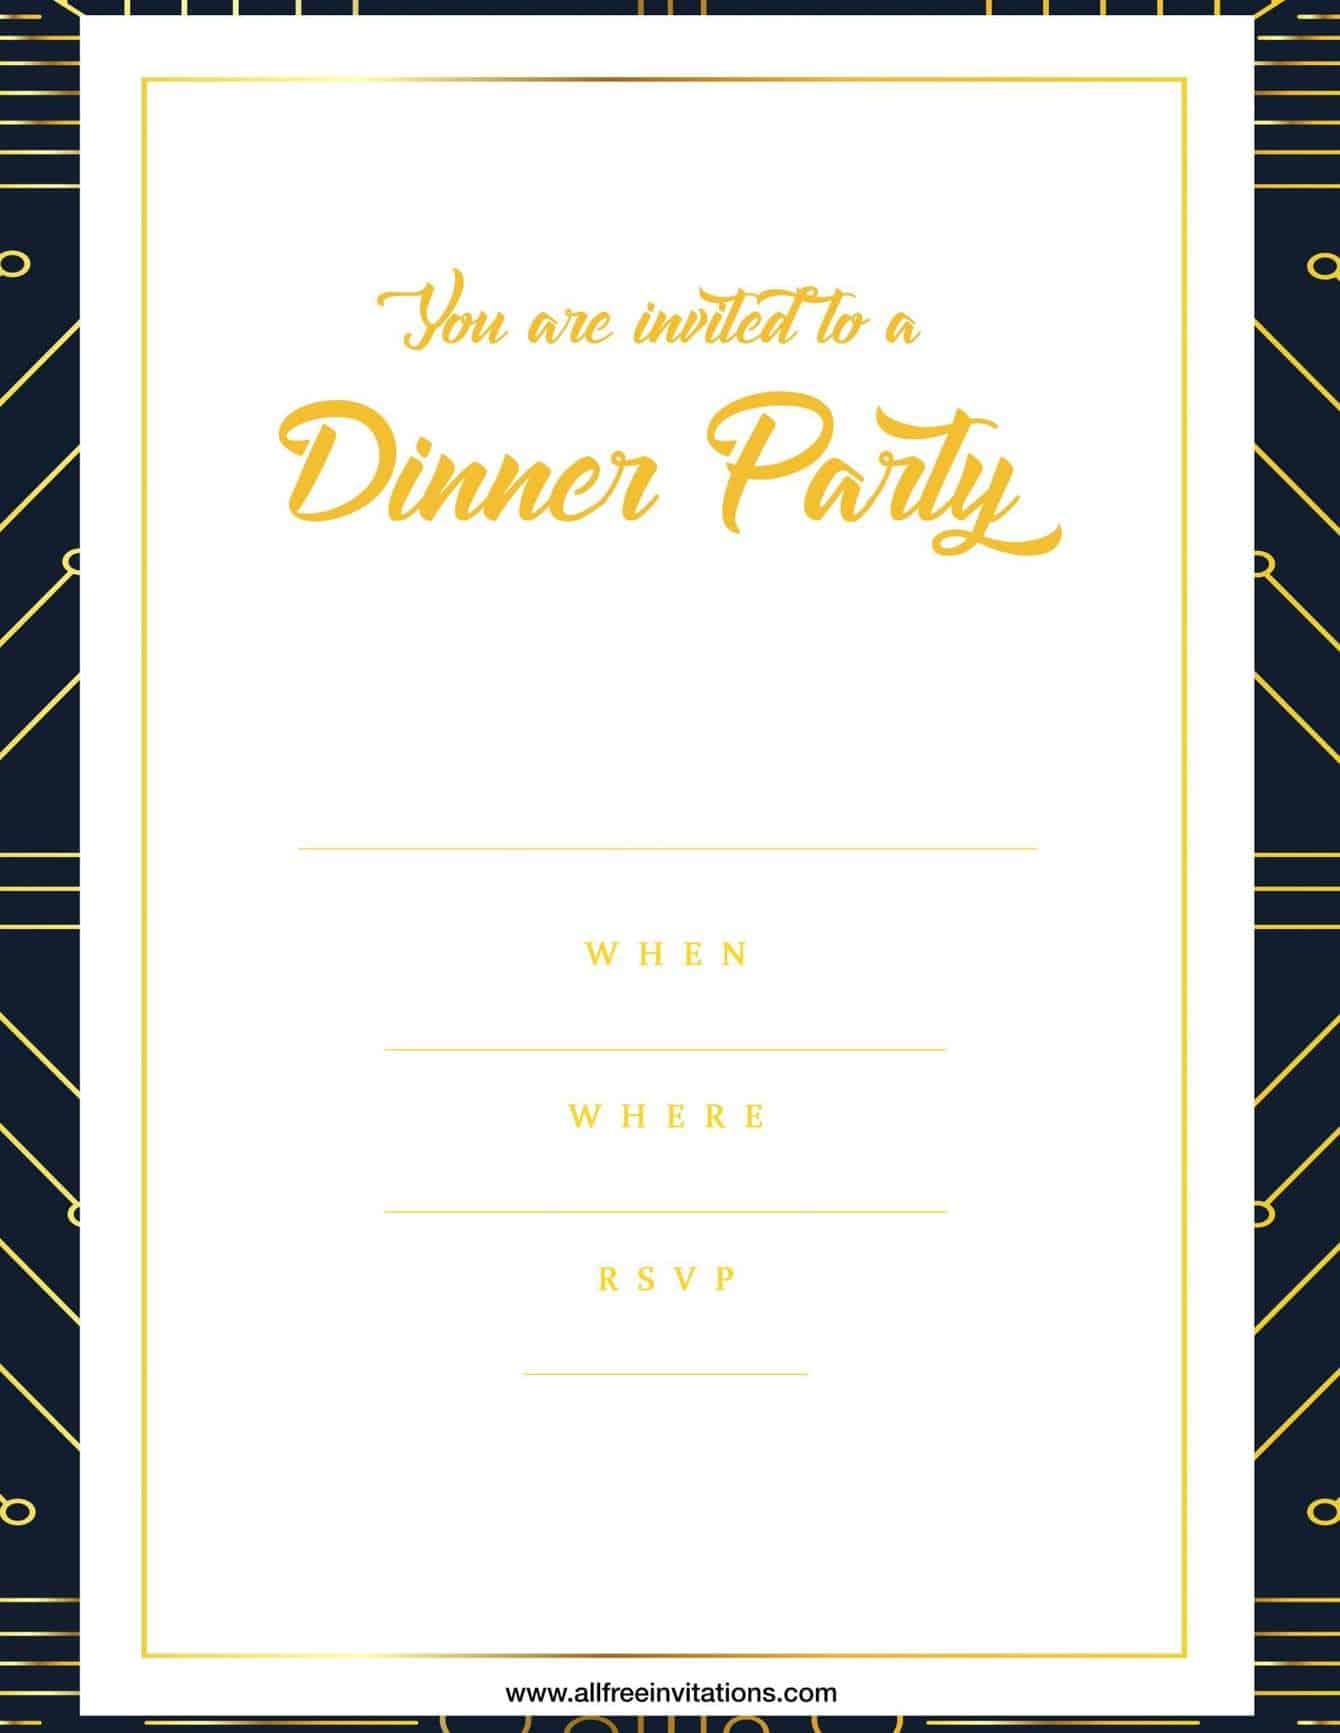 Dinner party invitation simple modern design